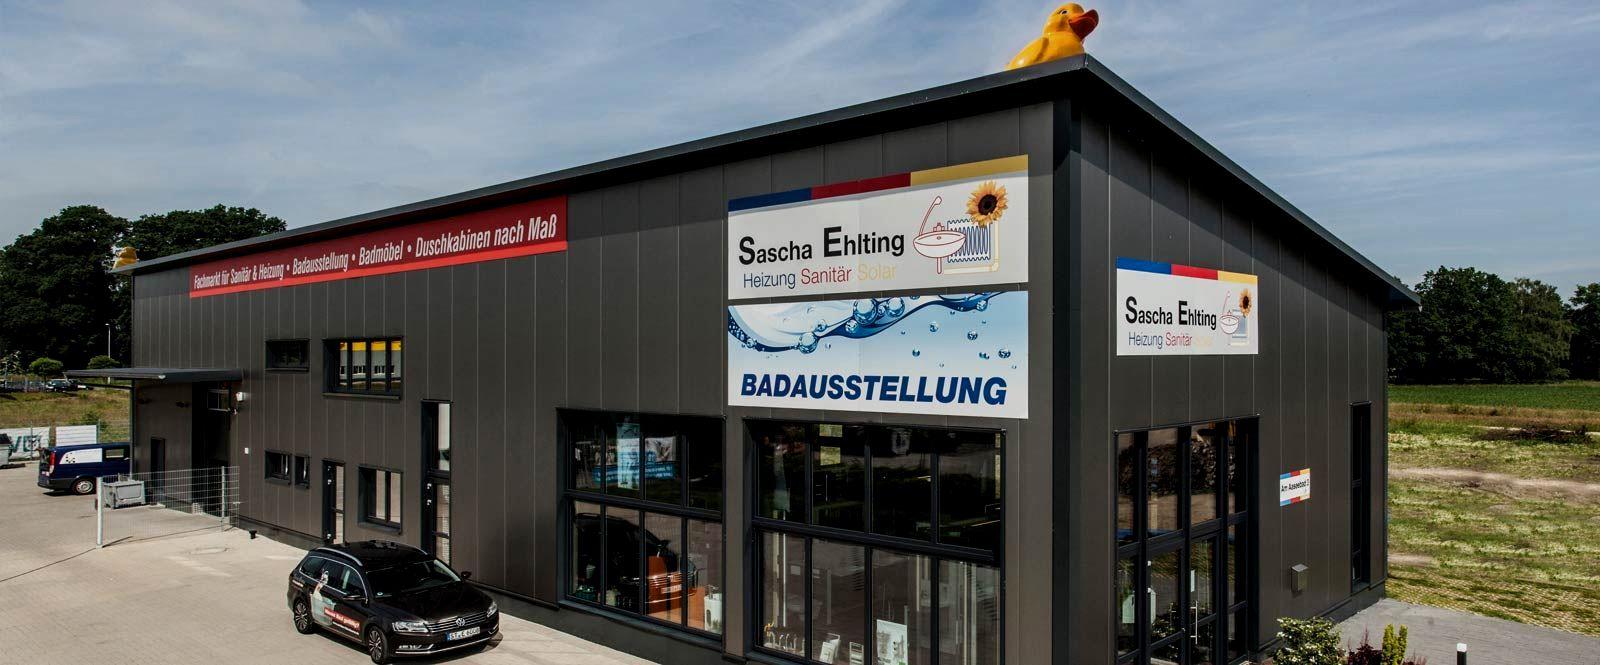 Sascha Ehlting Heizung Sanitär Solar